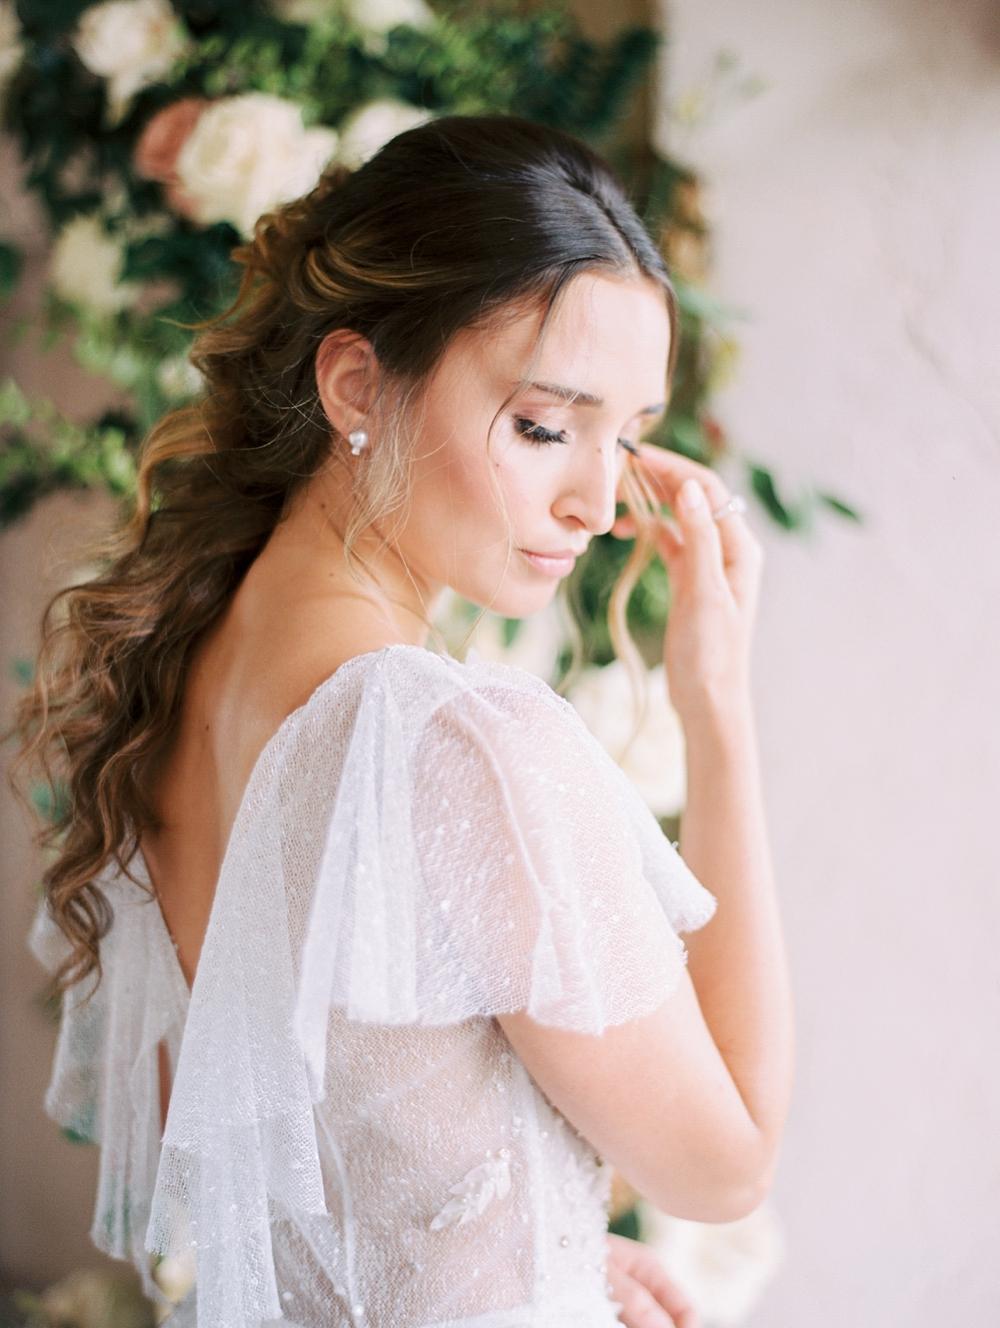 kristin-la-voie-photography-Austin-Wedding-Photographer-Villa-Antonia-169